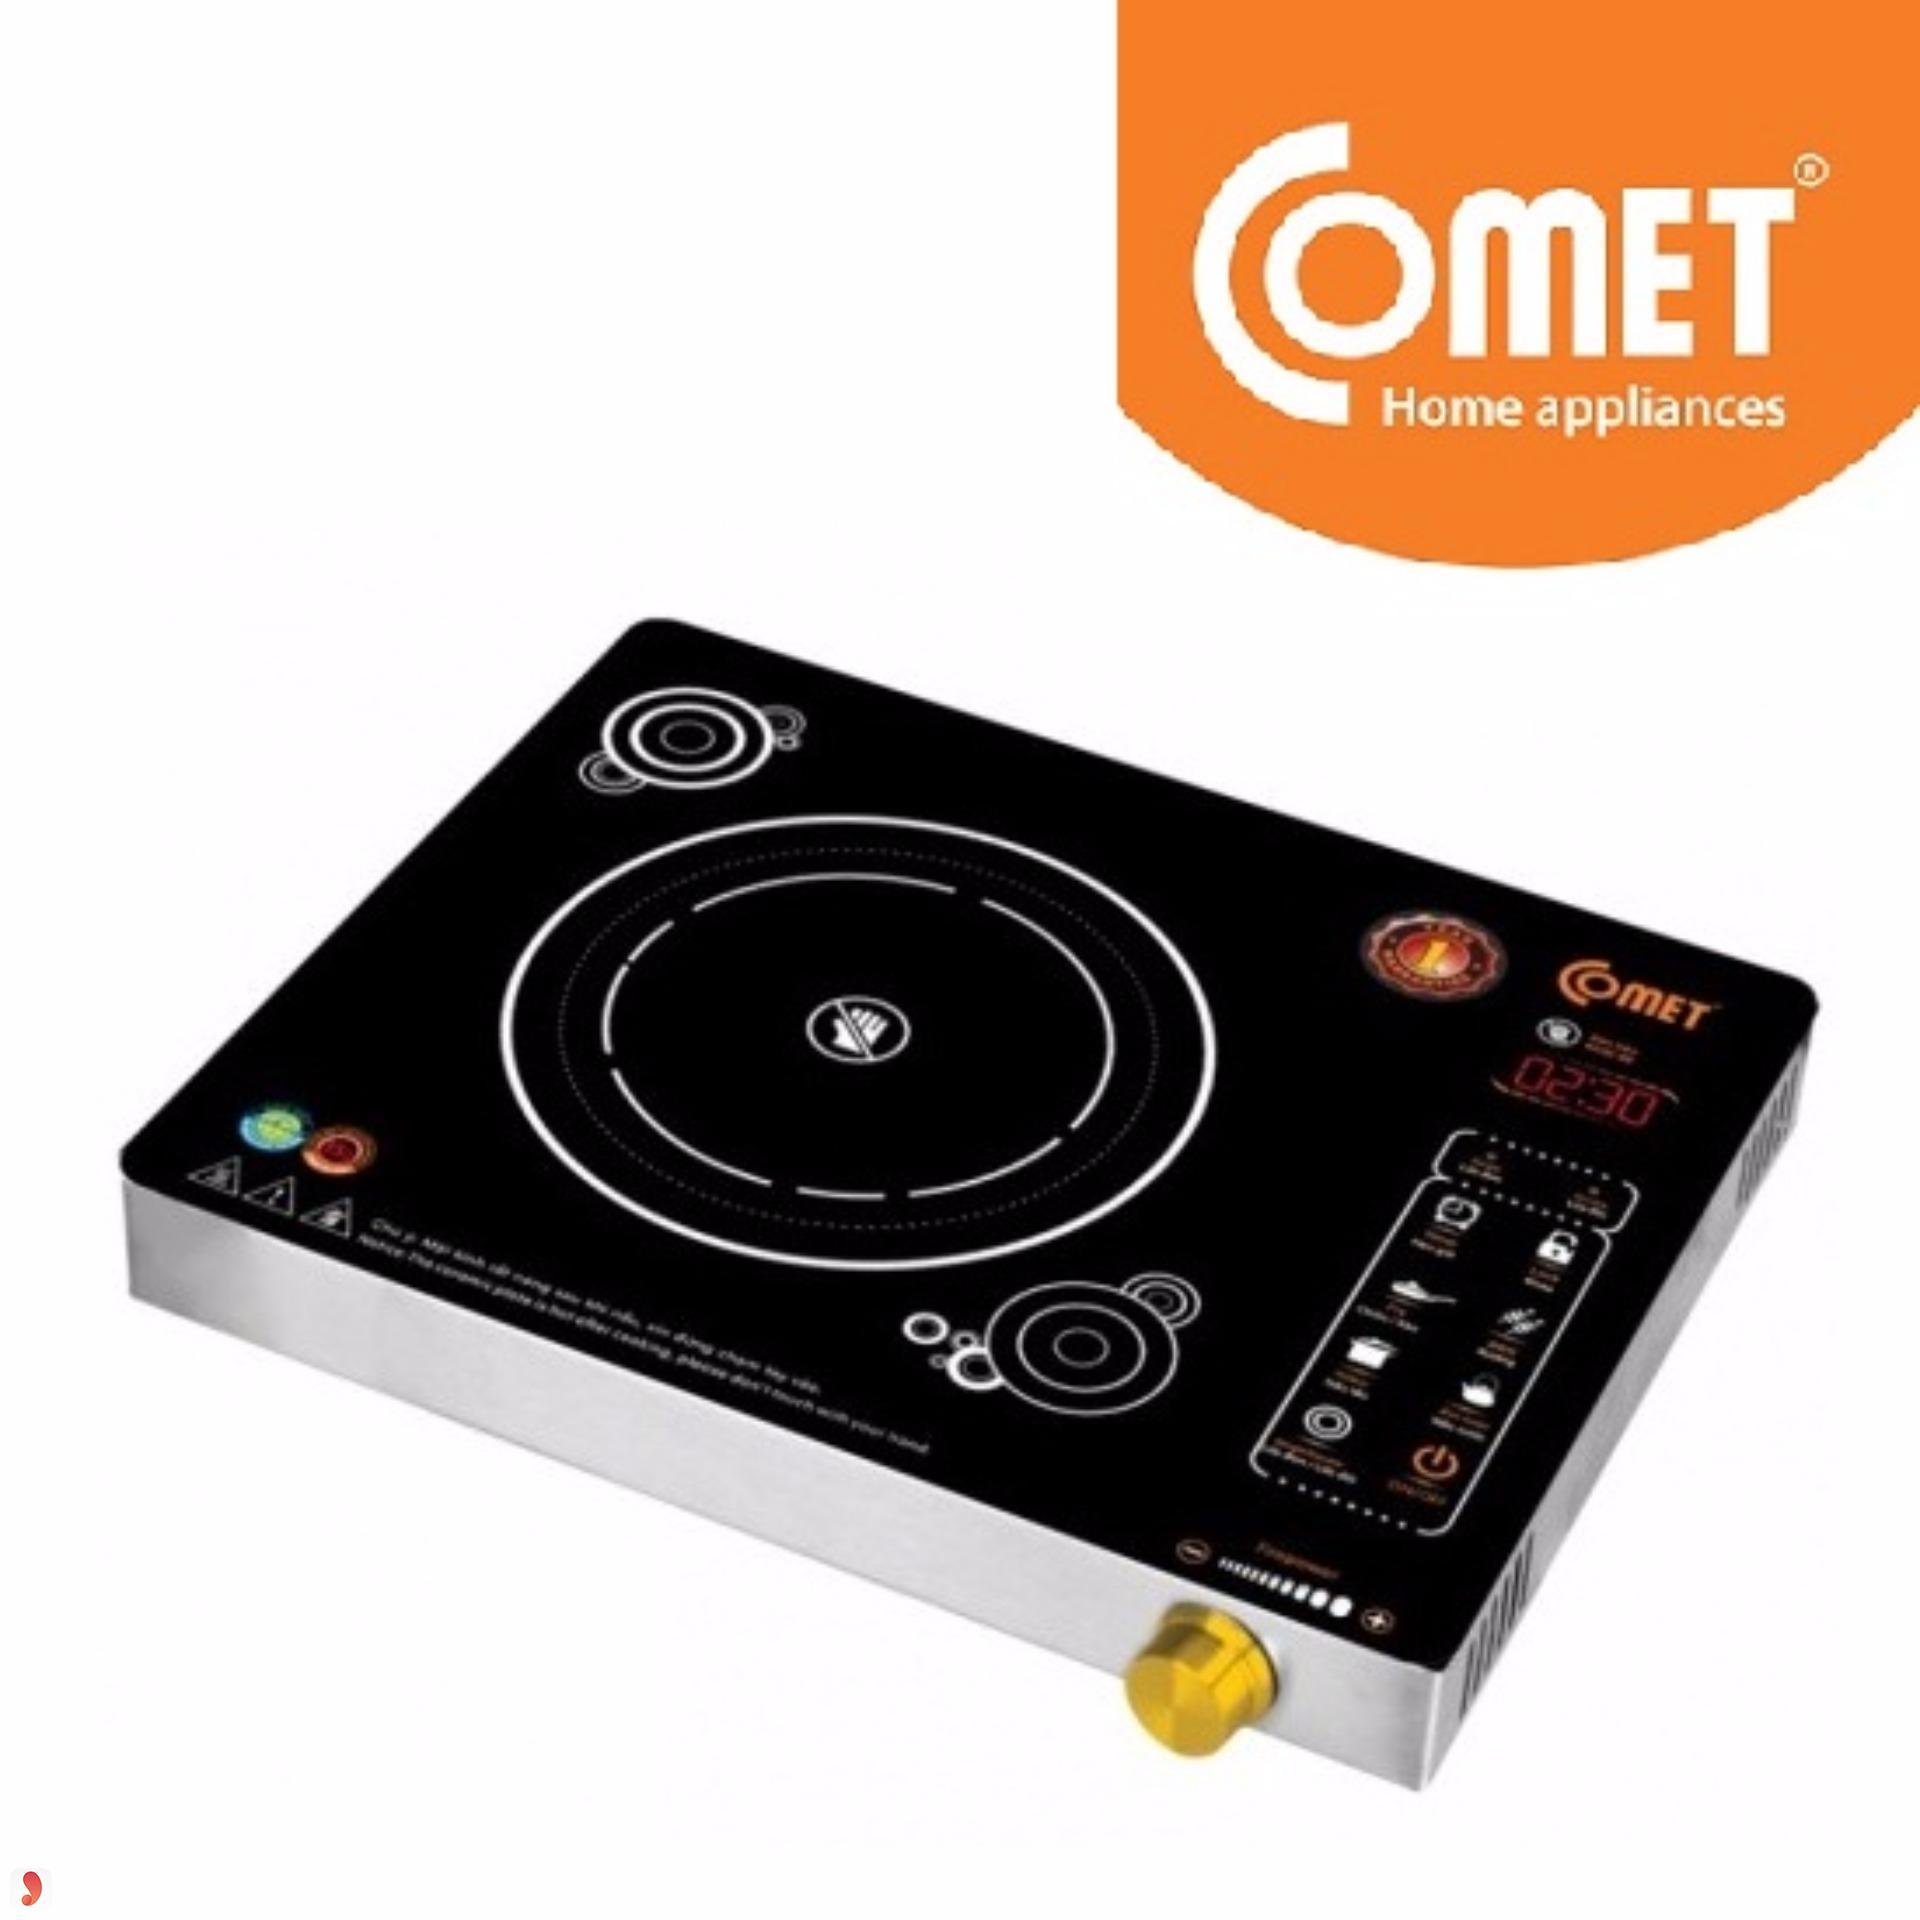 Bếp hồng ngoại Comet